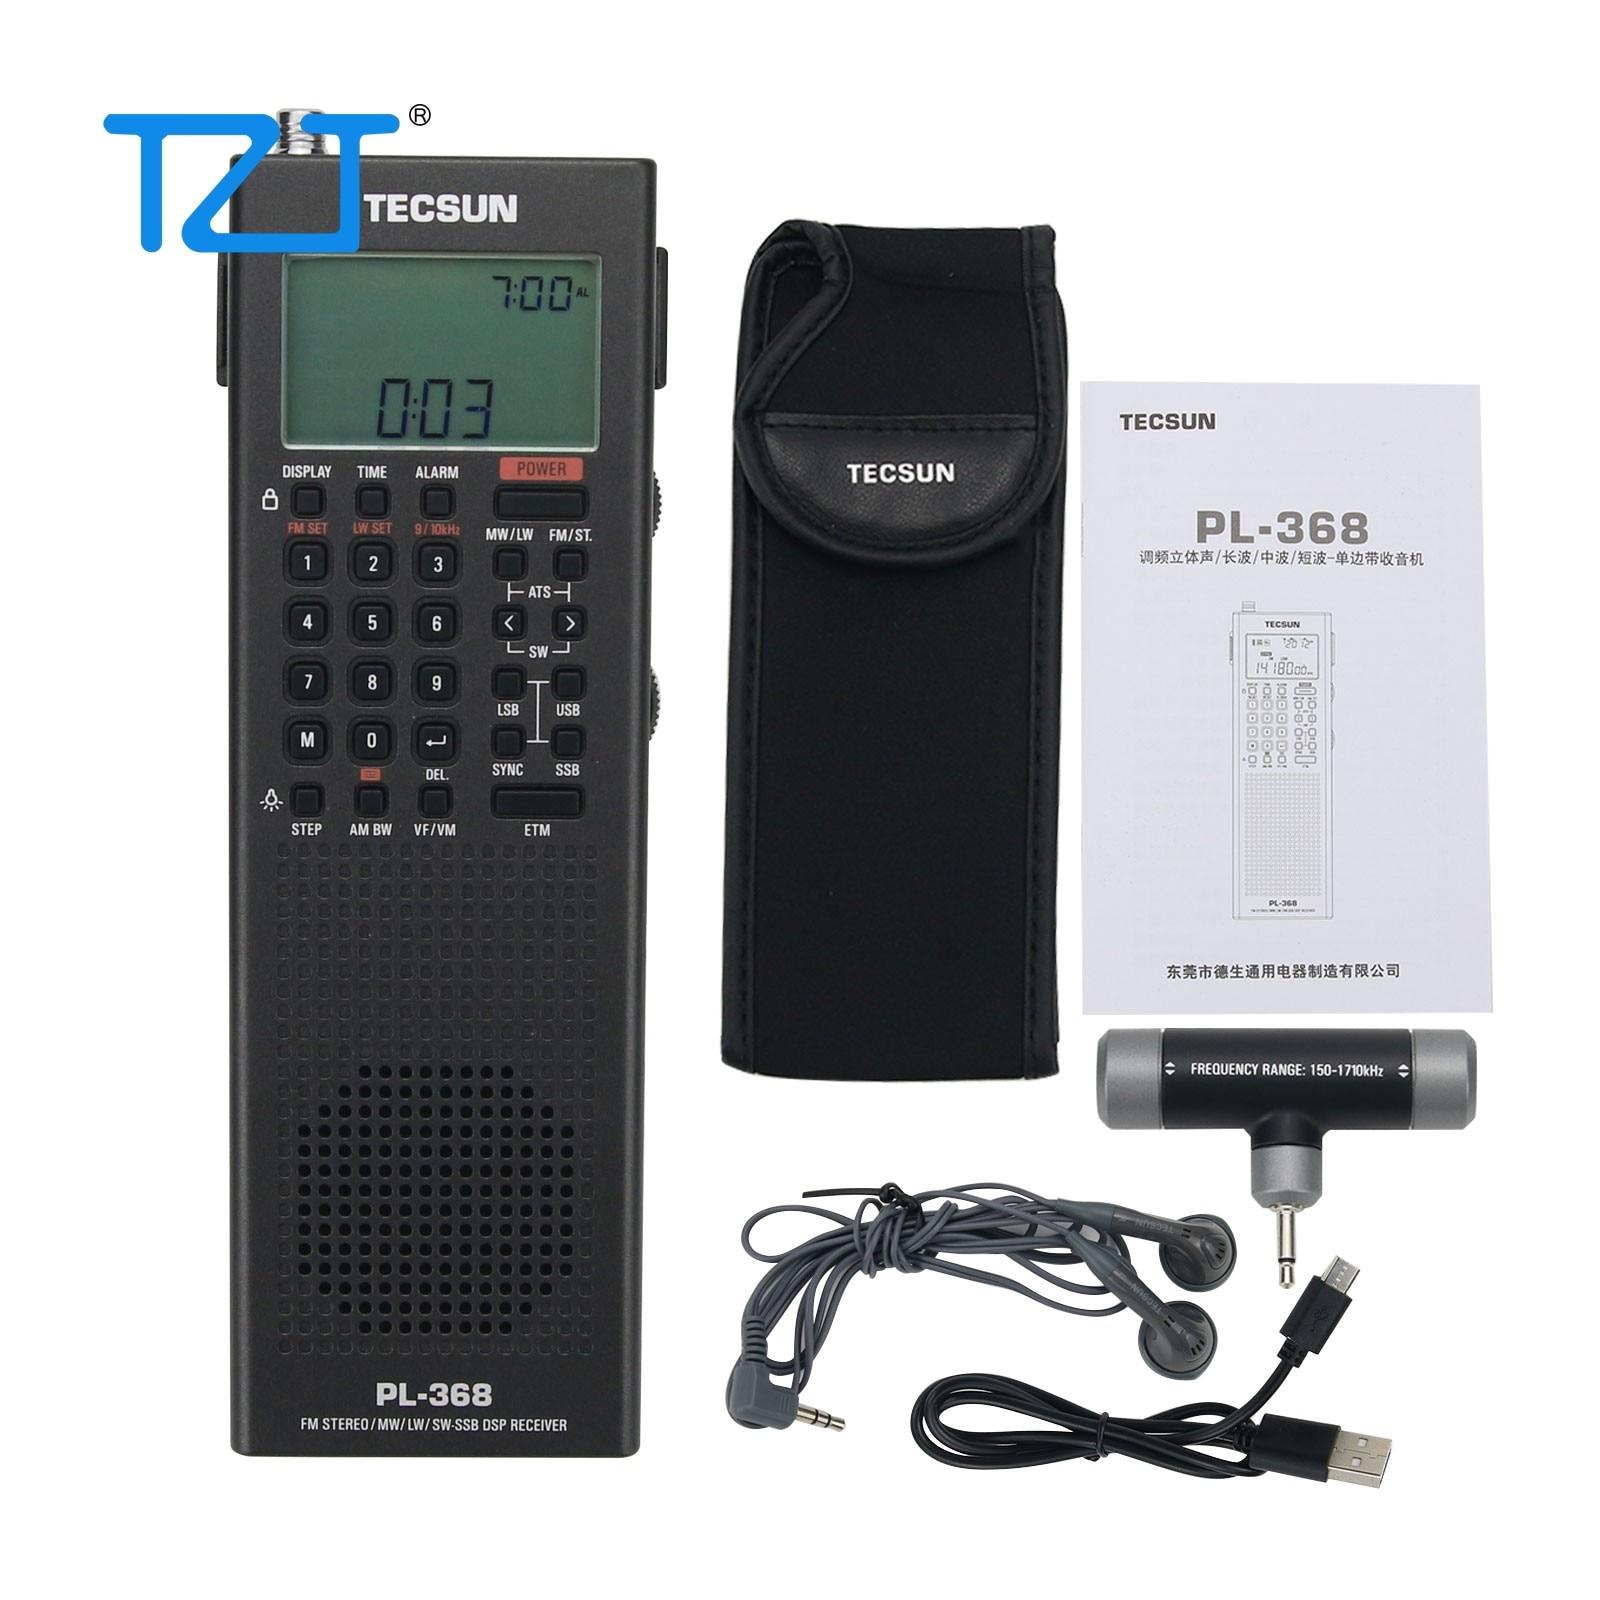 Radio Tecsun pl-368 64-108mhz DSP Demodulation Usb-Charge Stereo Digital Full-Band